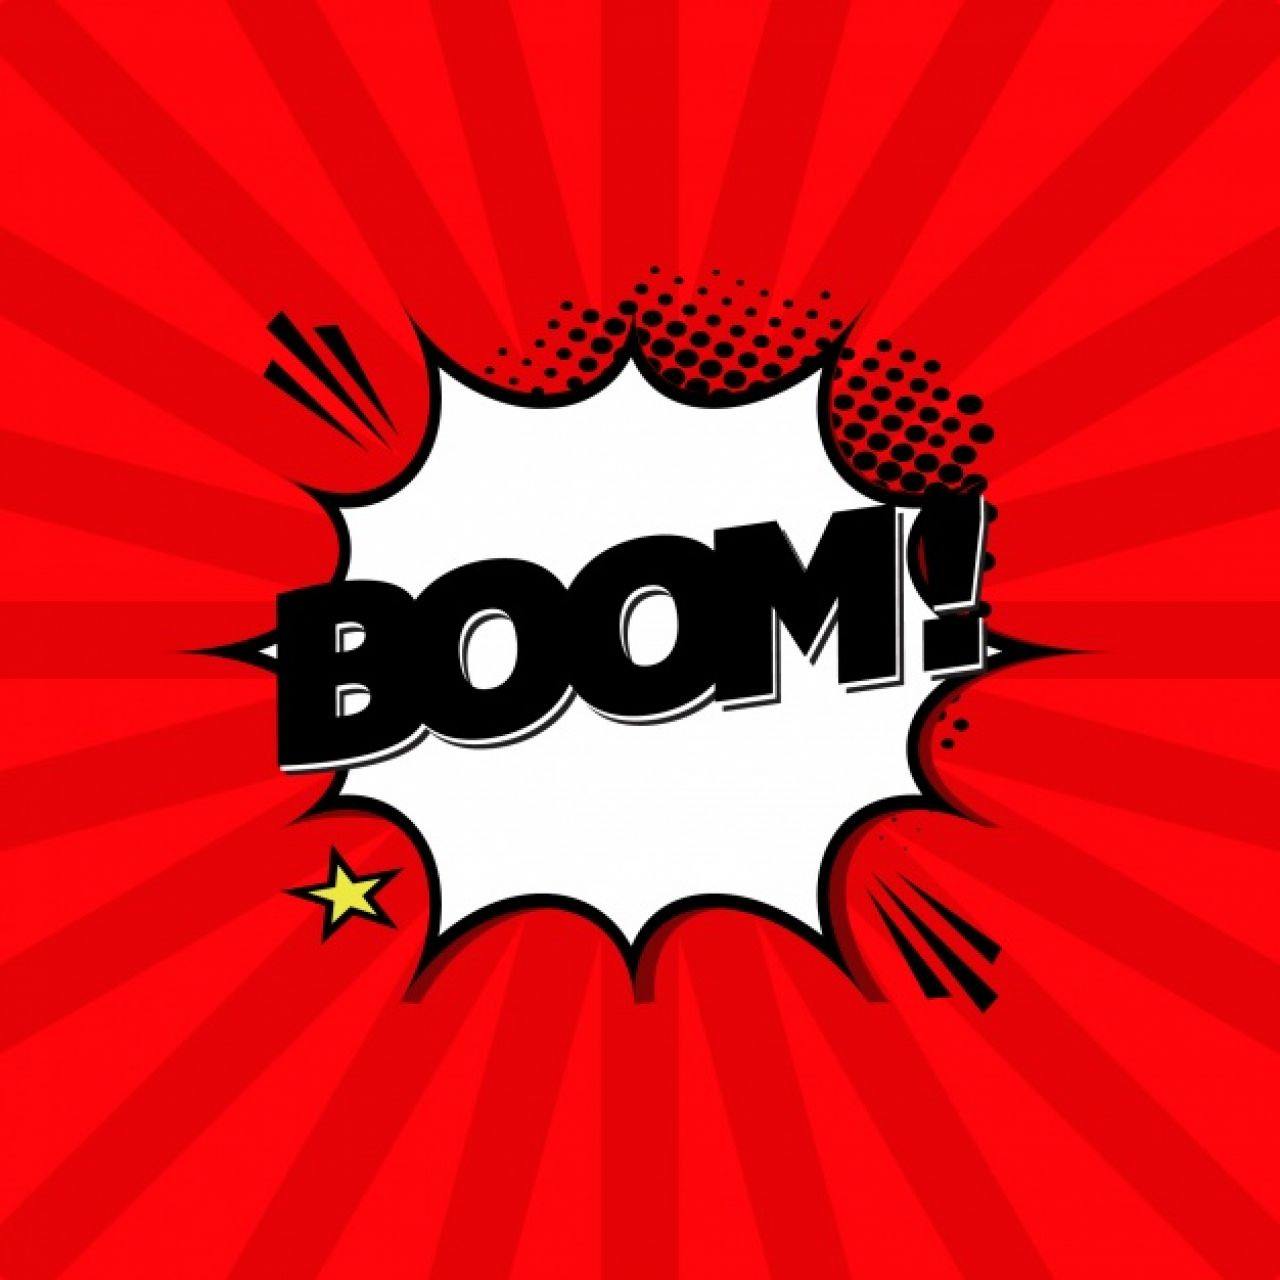 Boom theme из категории Шаблоны для CMS OpenCart (ОпенКарт)